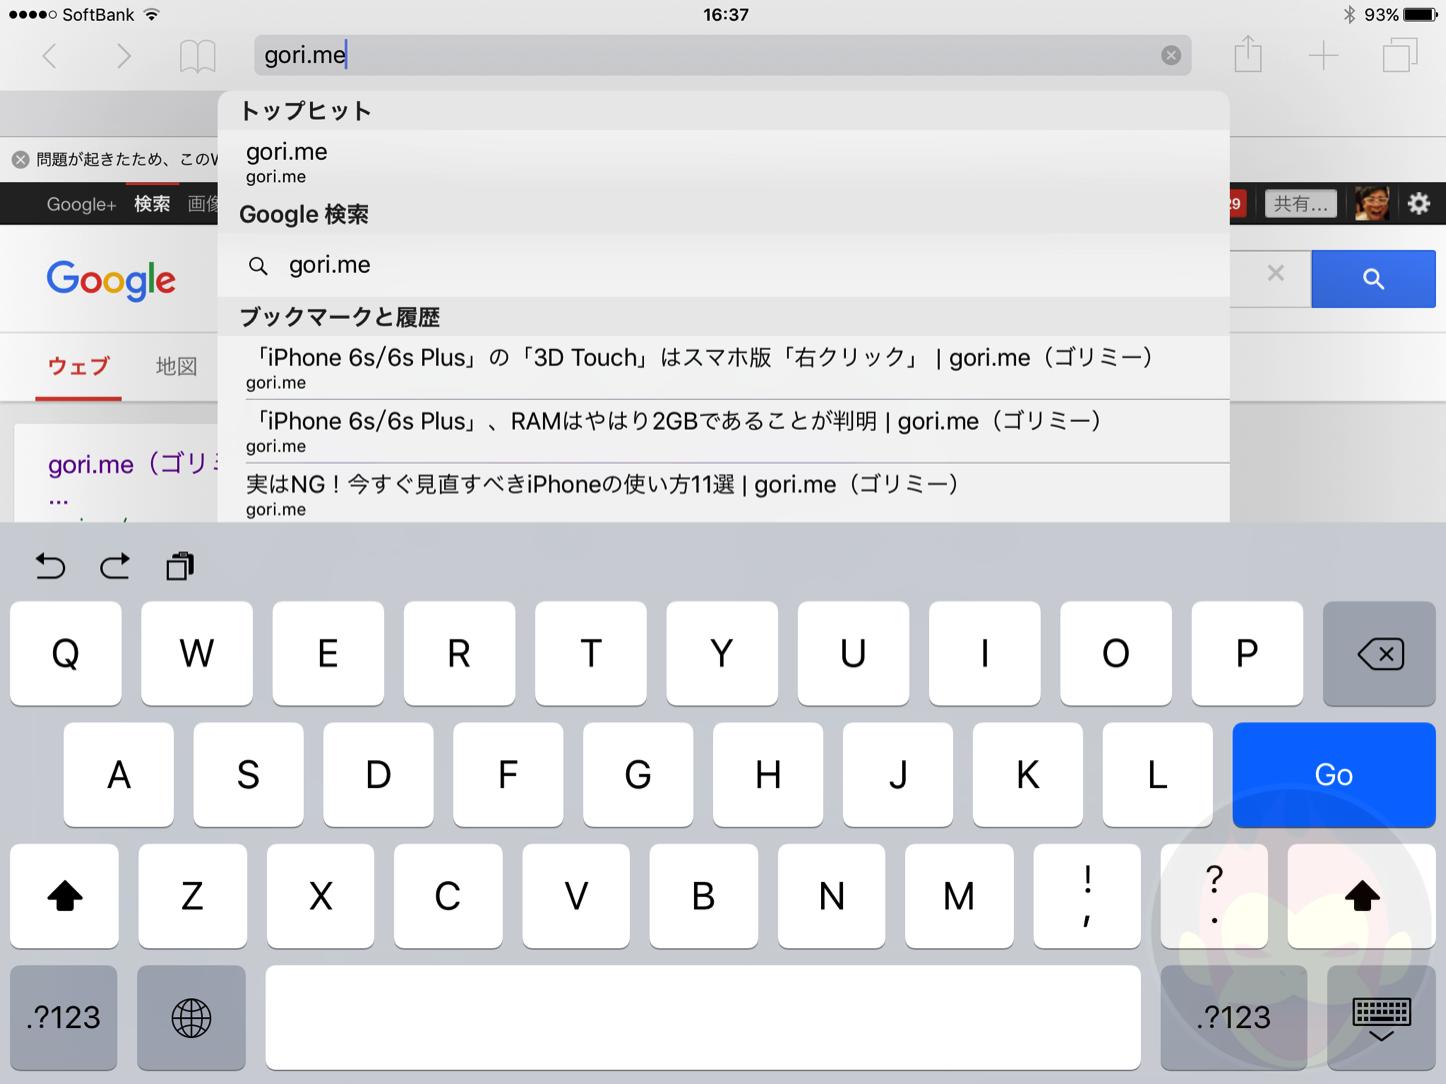 iOS-9-iPad-Screen-Shot-33.png